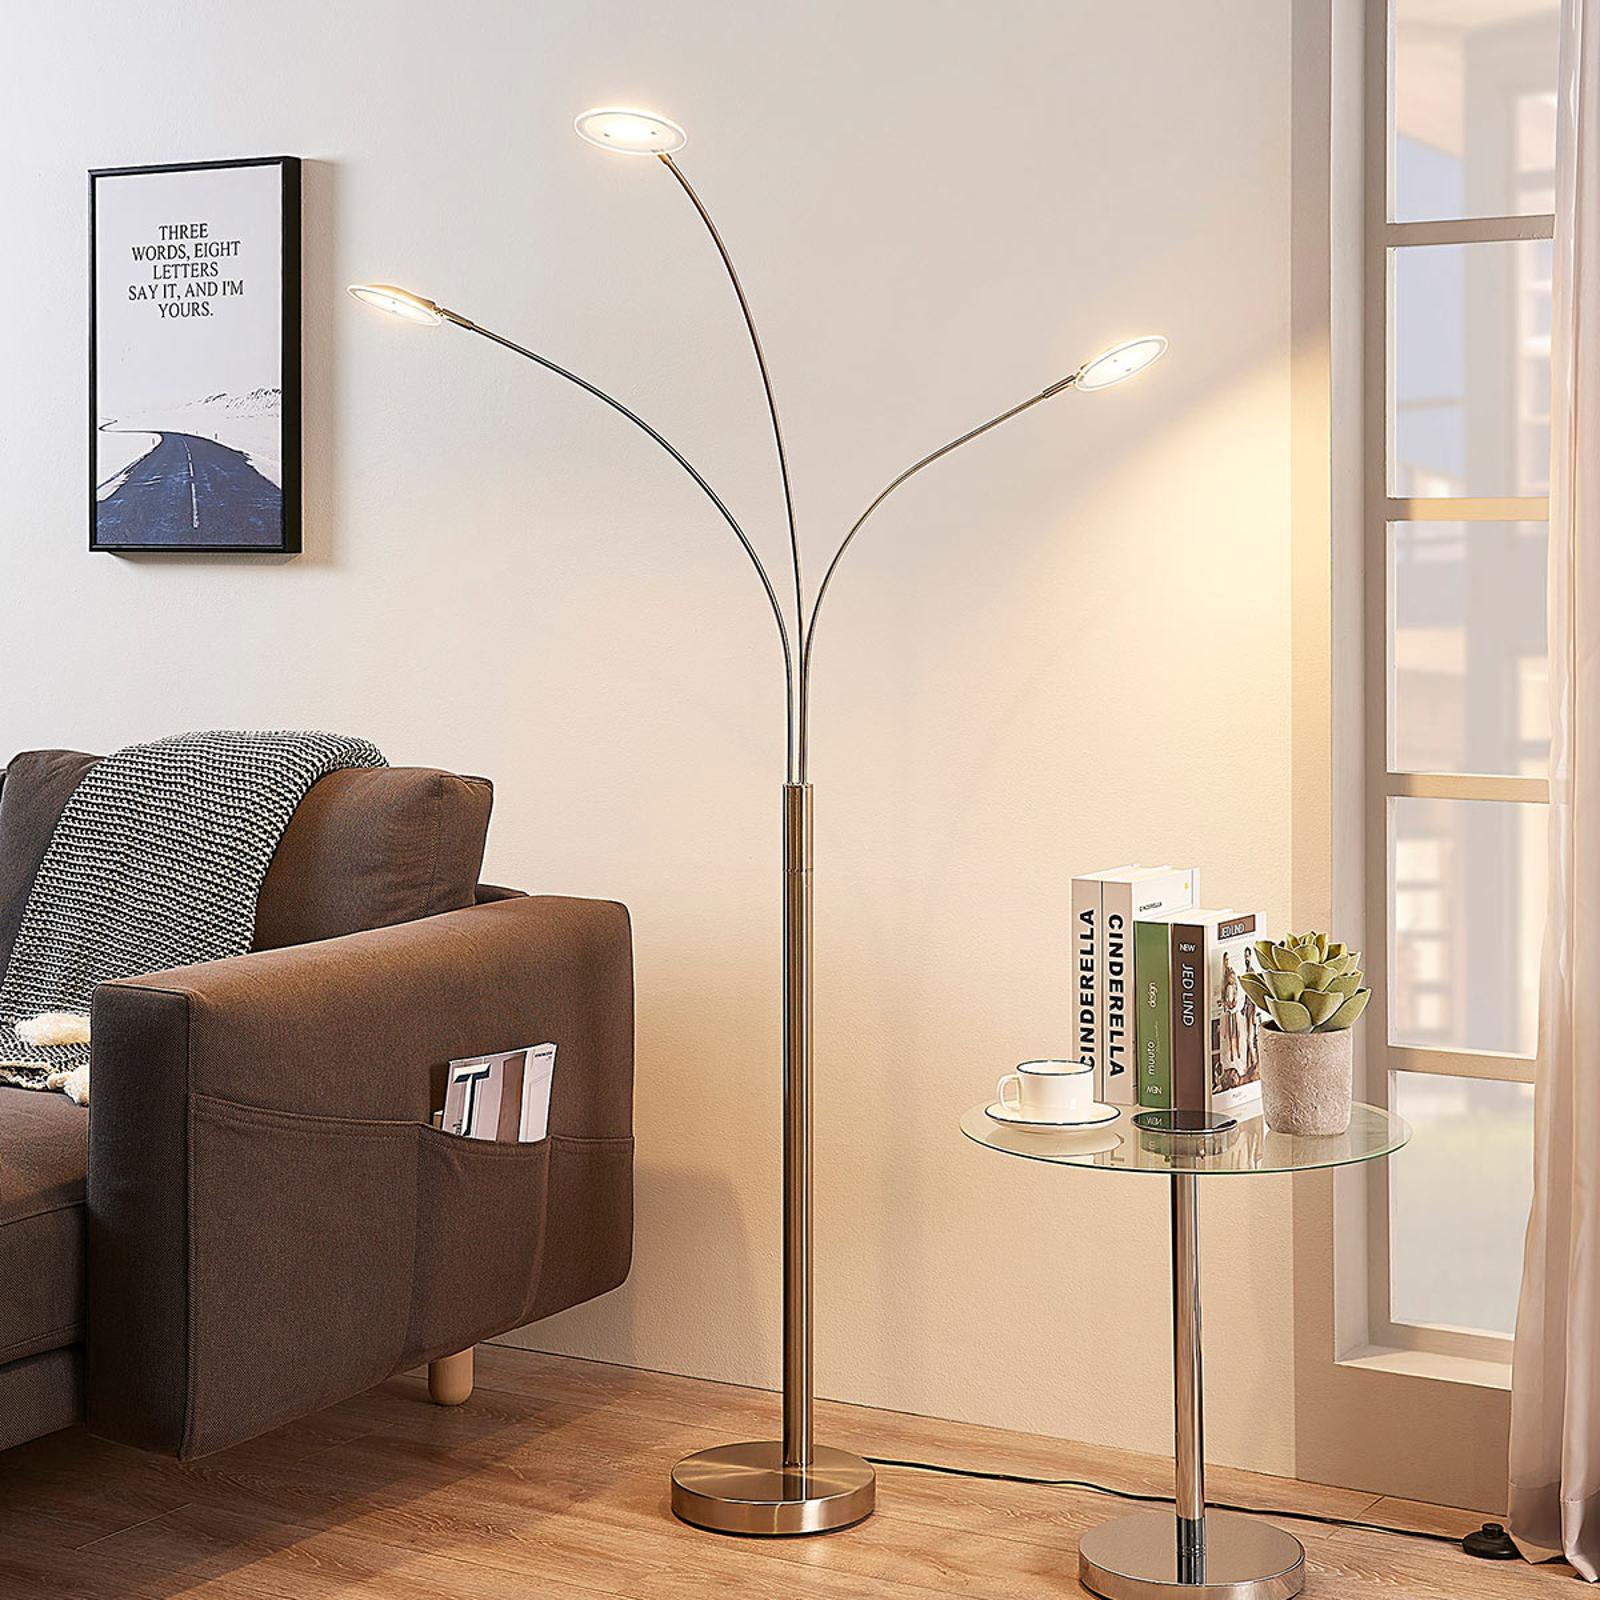 3-flammige LED-Stehlampe Anea